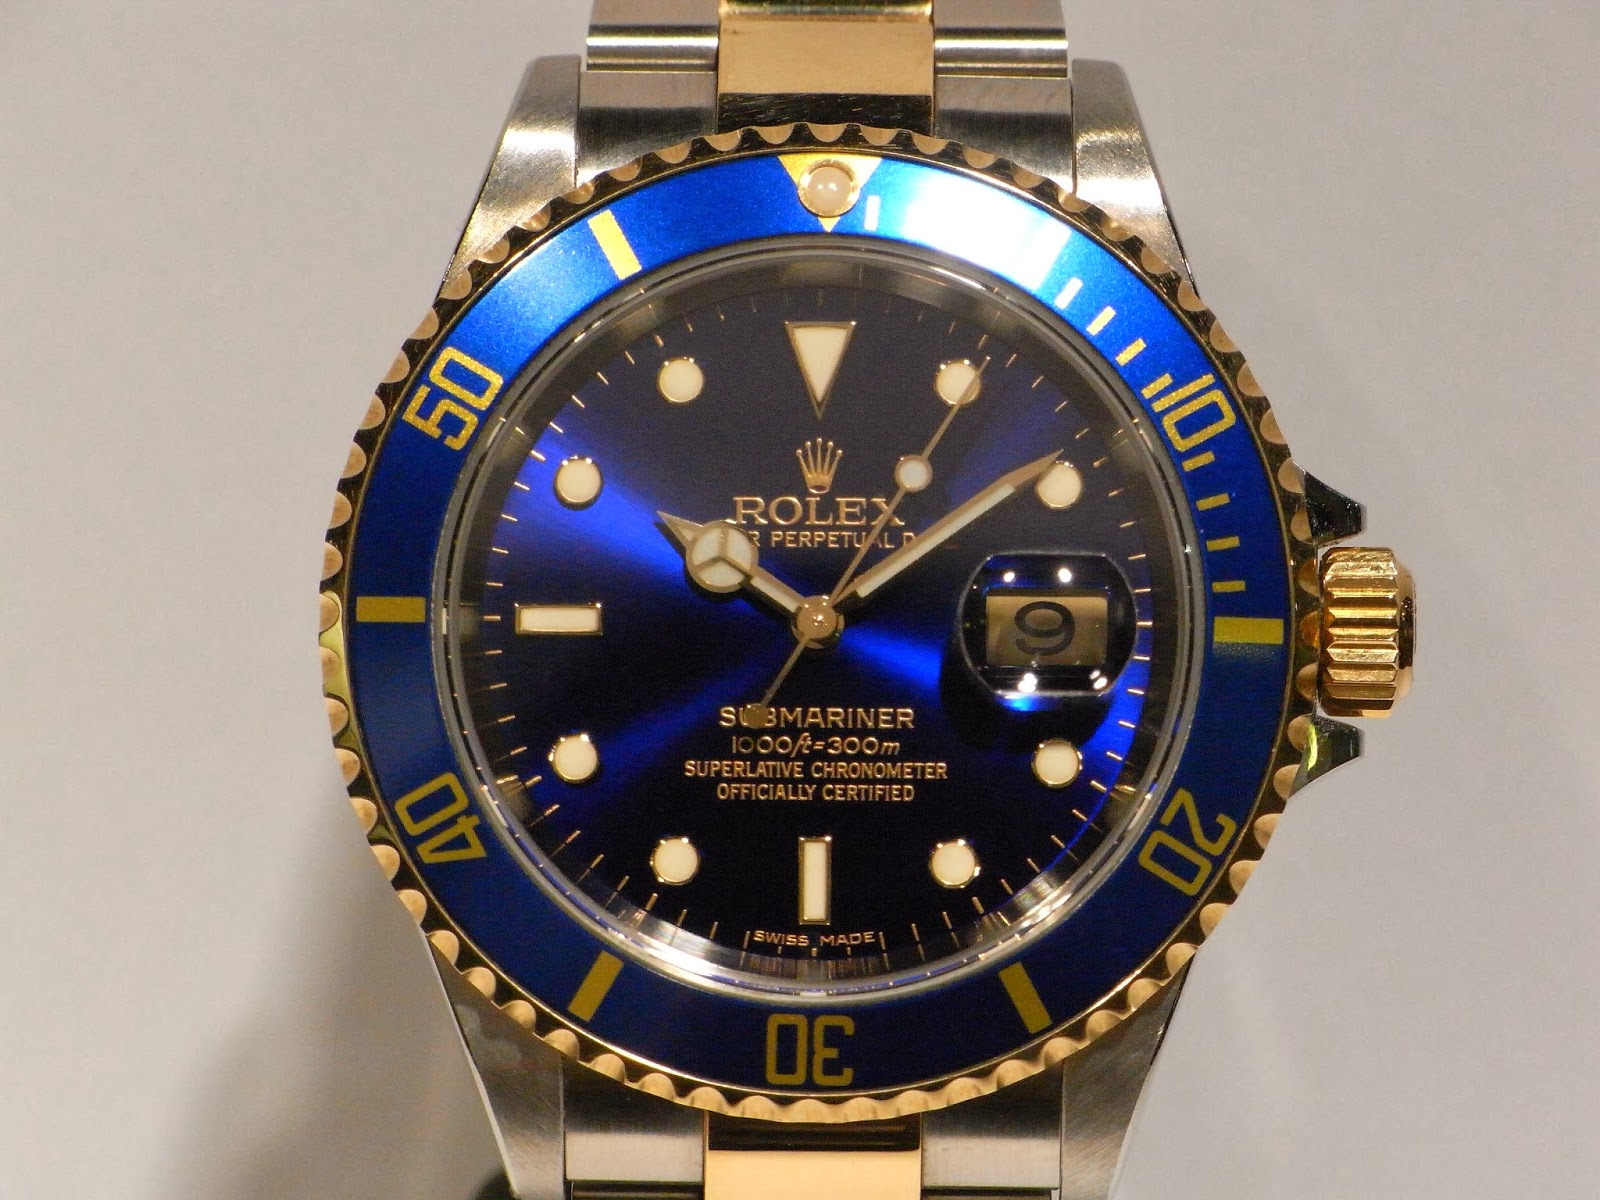 勞力士二手錶行: ROLEX SUBMARINER 16613LB